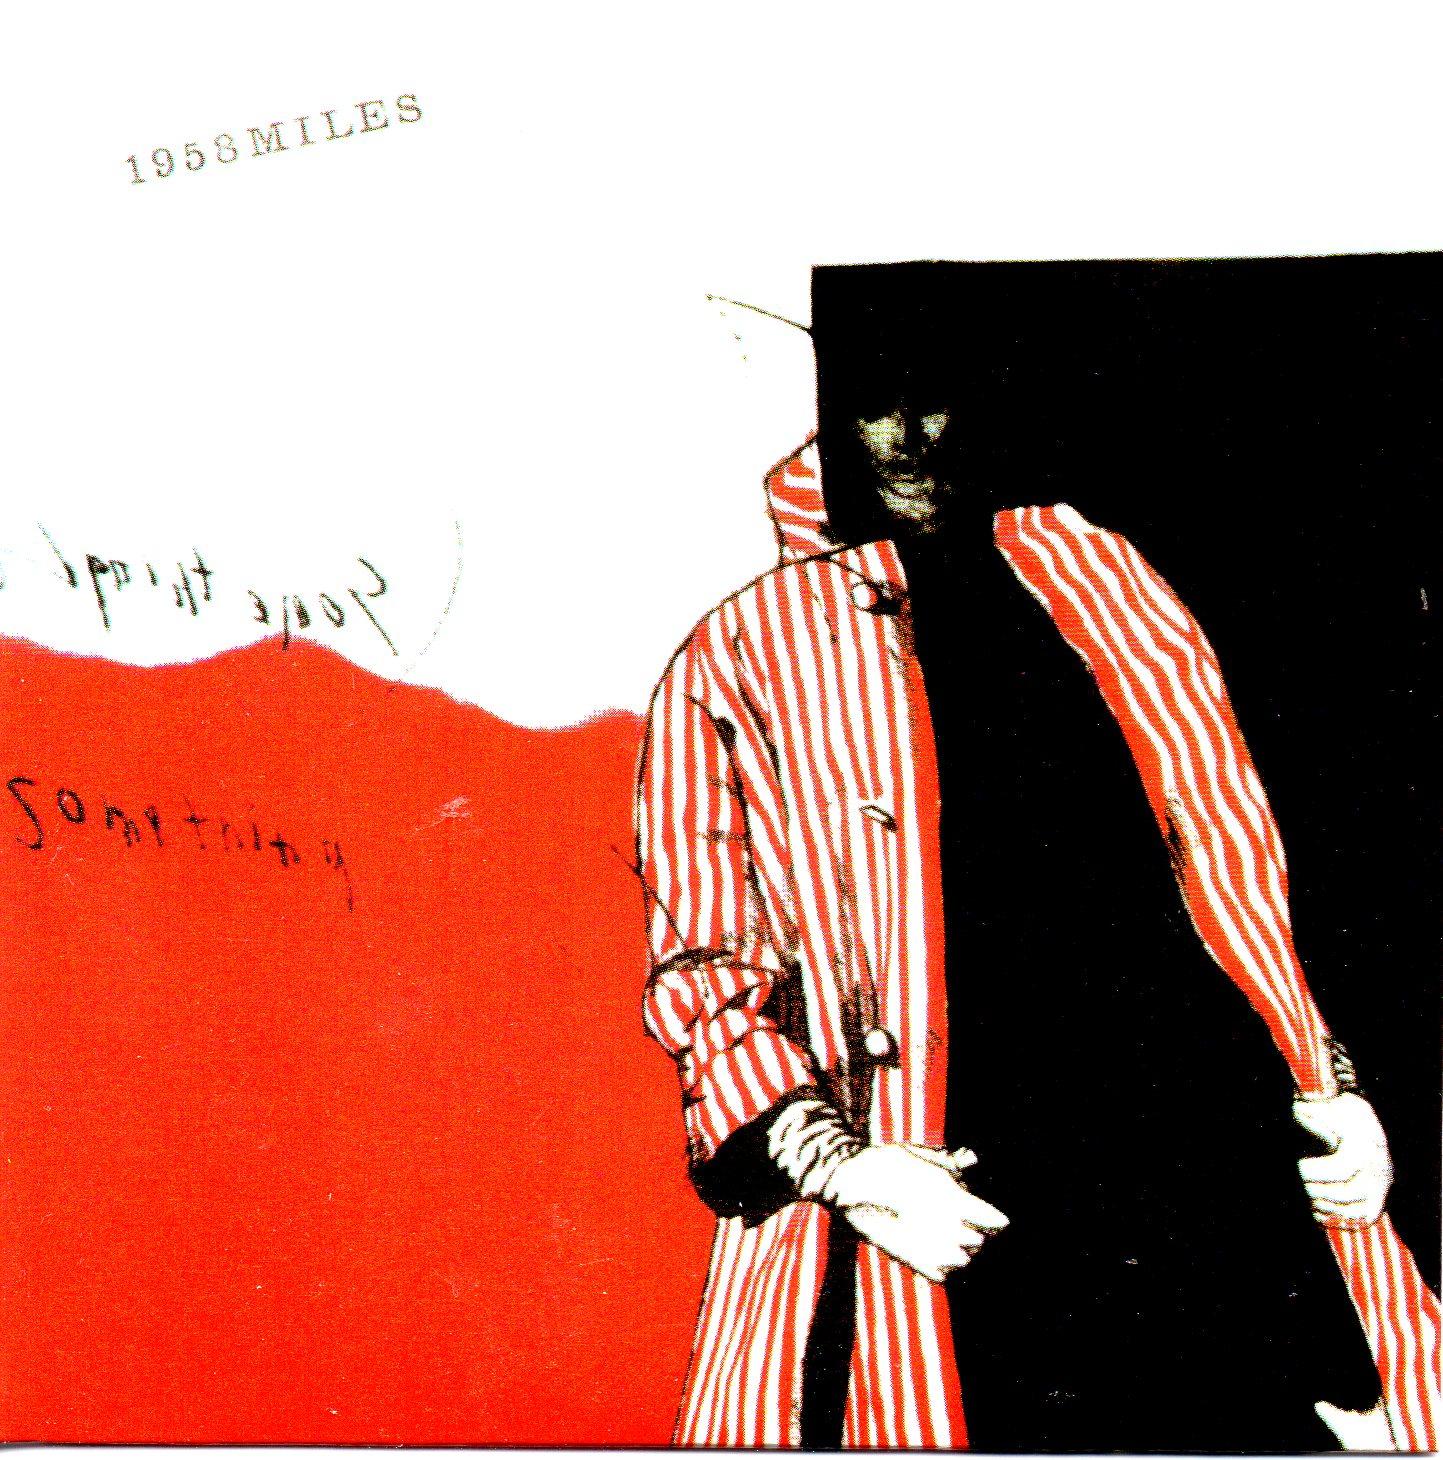 MILES DAVIS - 1958 Miles 7-track CARD SLEEVE (Pochette Cartonnée) - CD